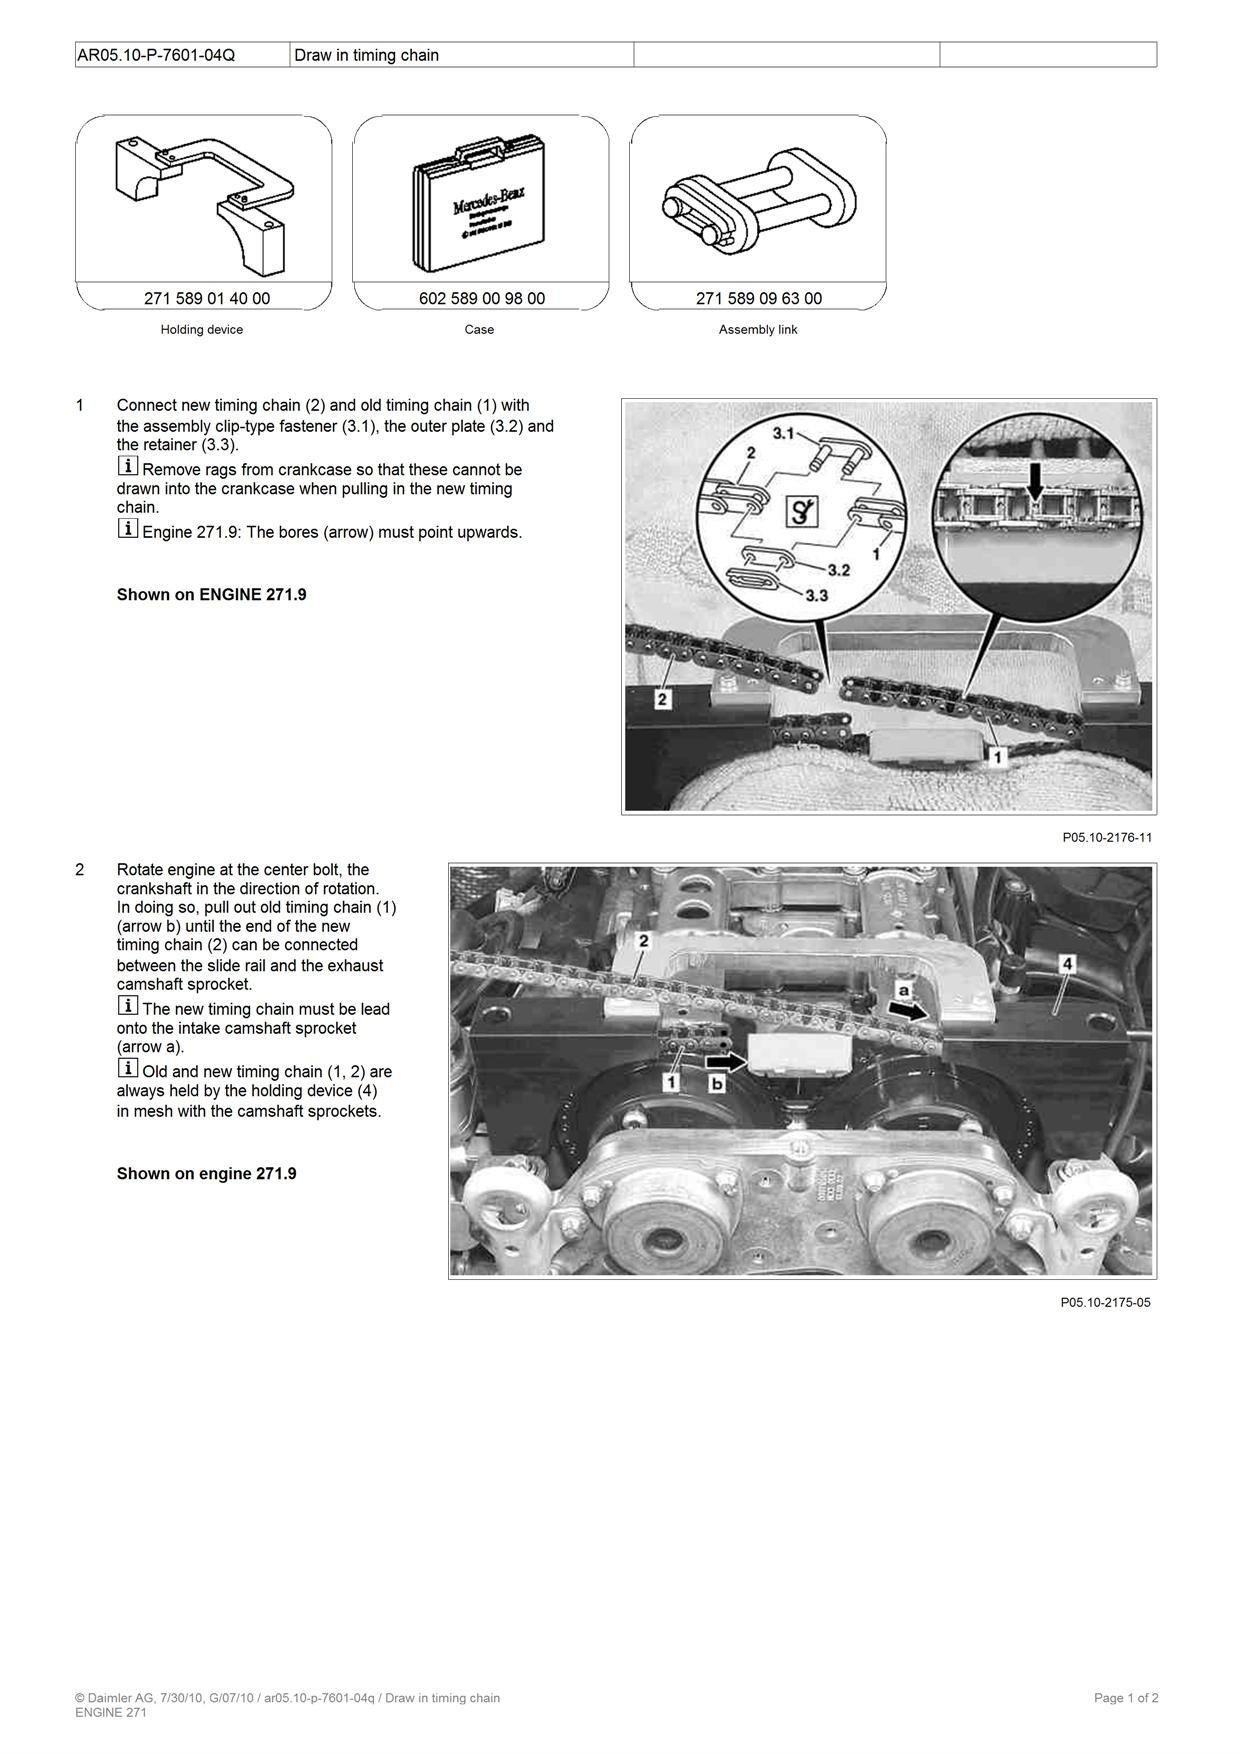 how to fix timingchin in c230 compresor